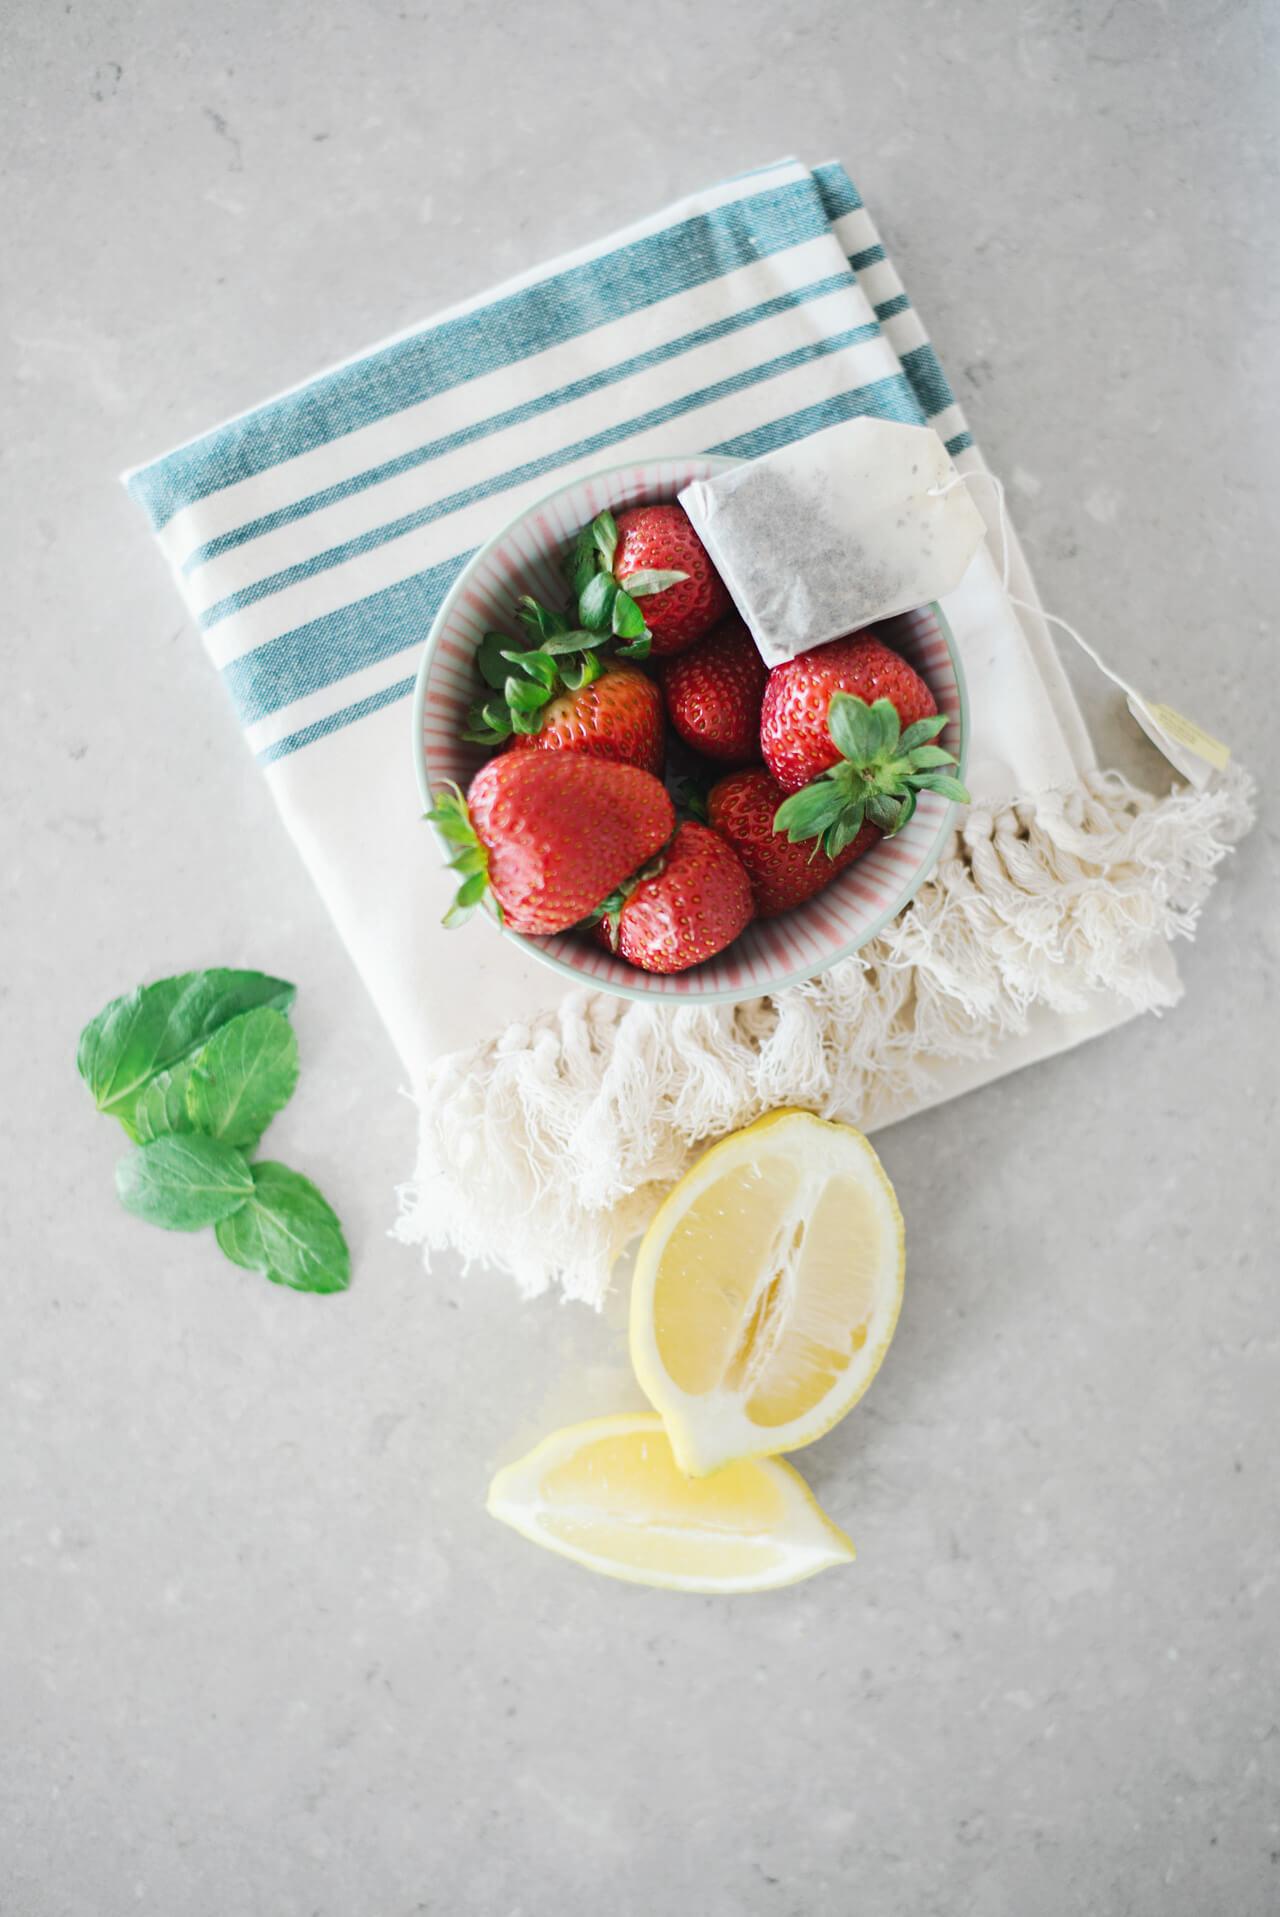 strawberries, lemon, mint and green tea infused water